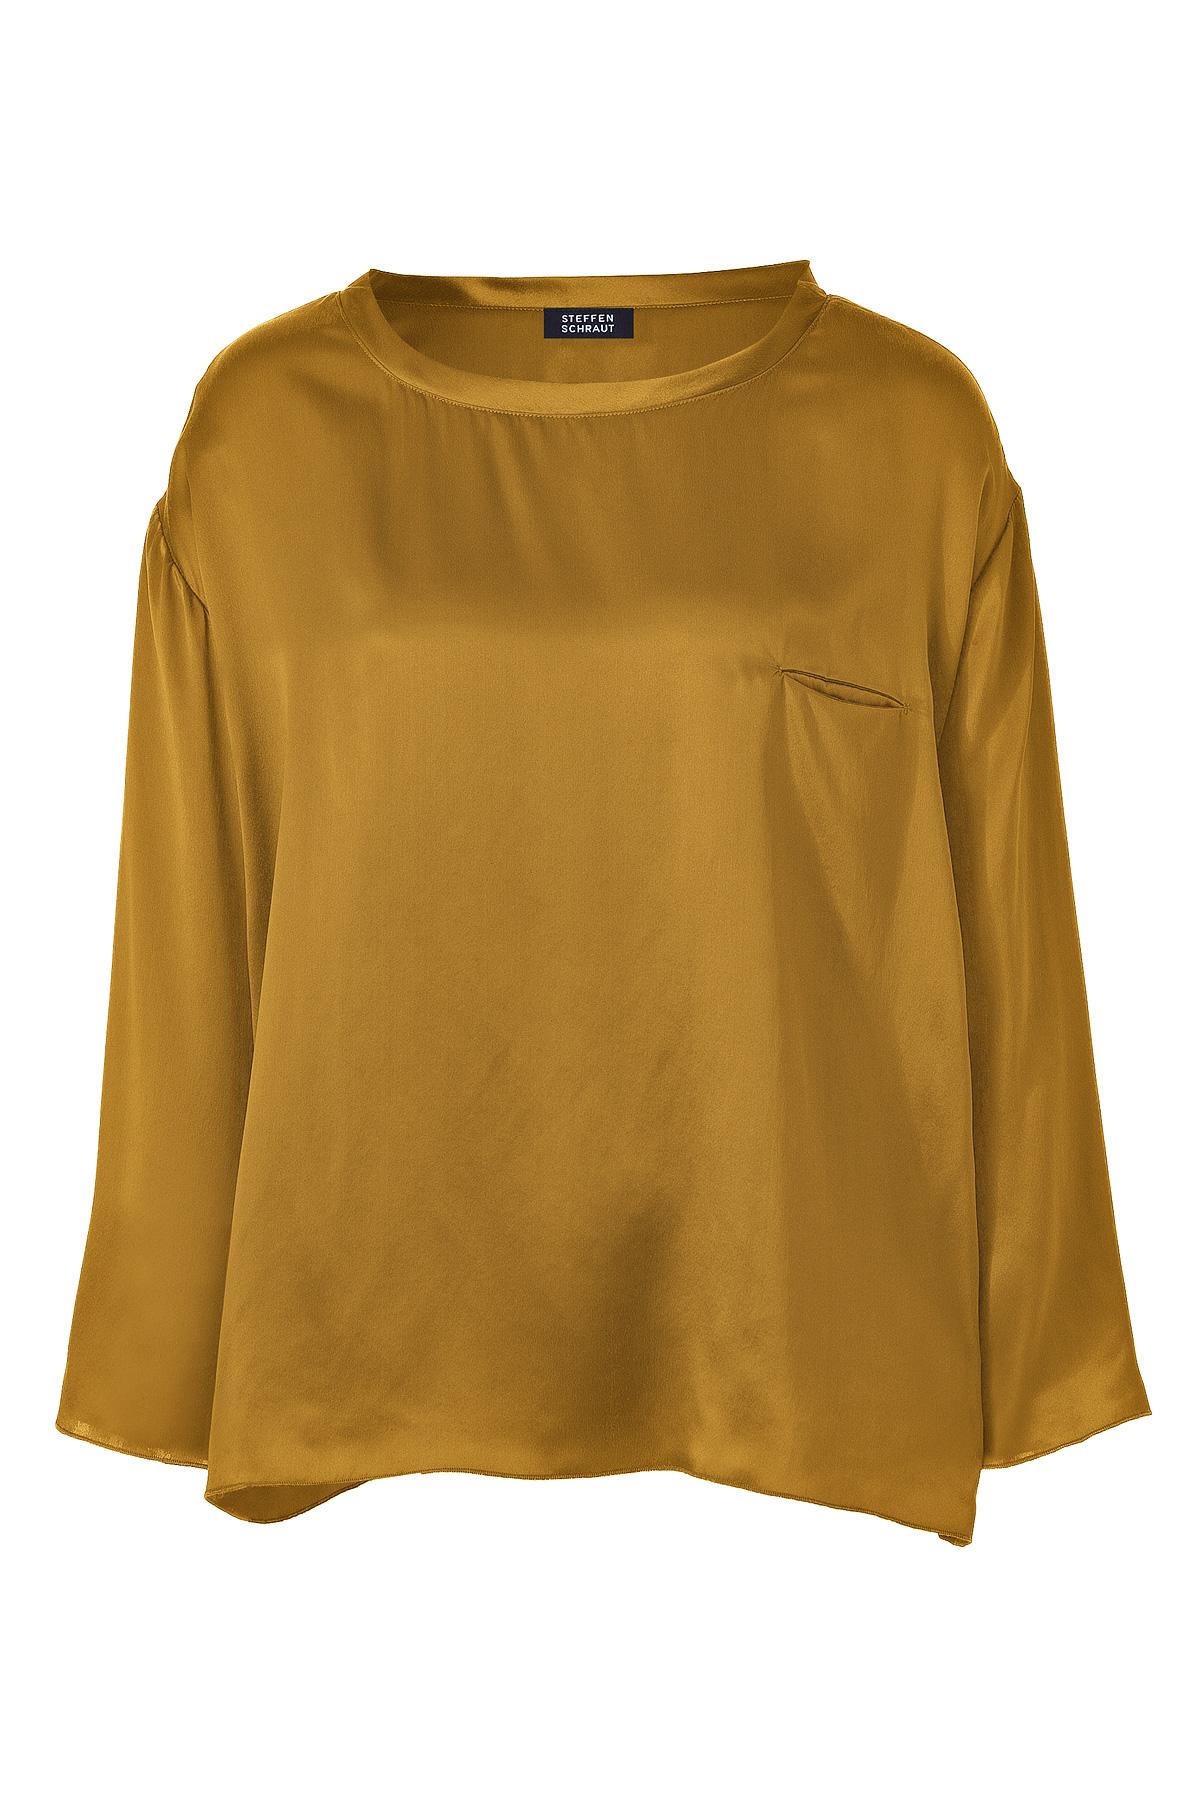 fa56a74b3c3fb7 Lyst - Steffen Schraut Winter Gold Silk Top in Metallic